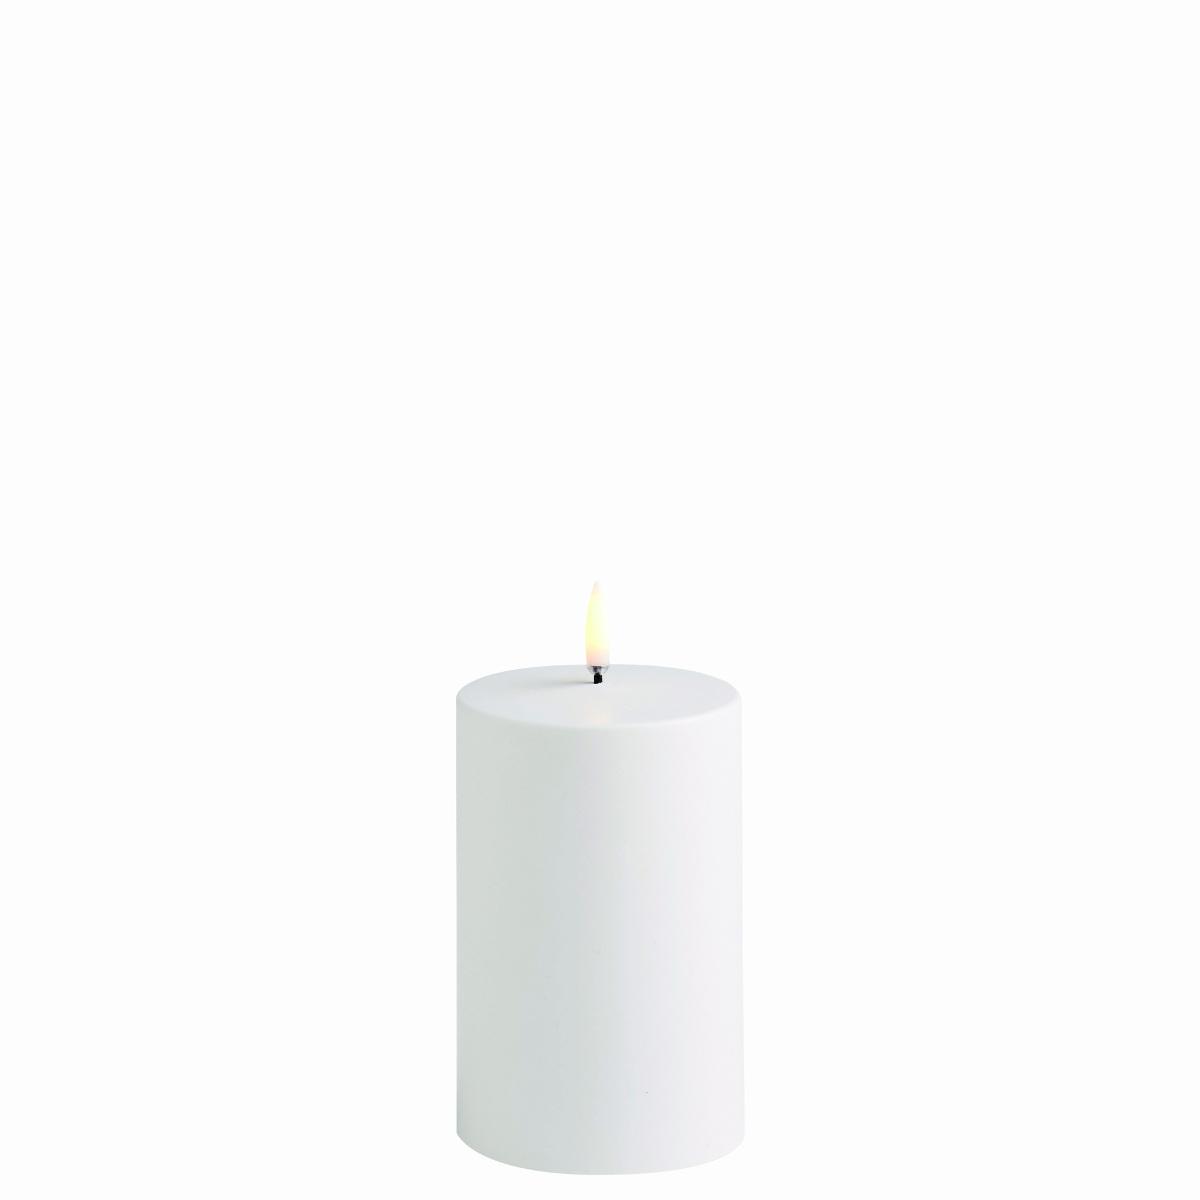 Kubbelys White 7.8x 12.7 cm Utelys